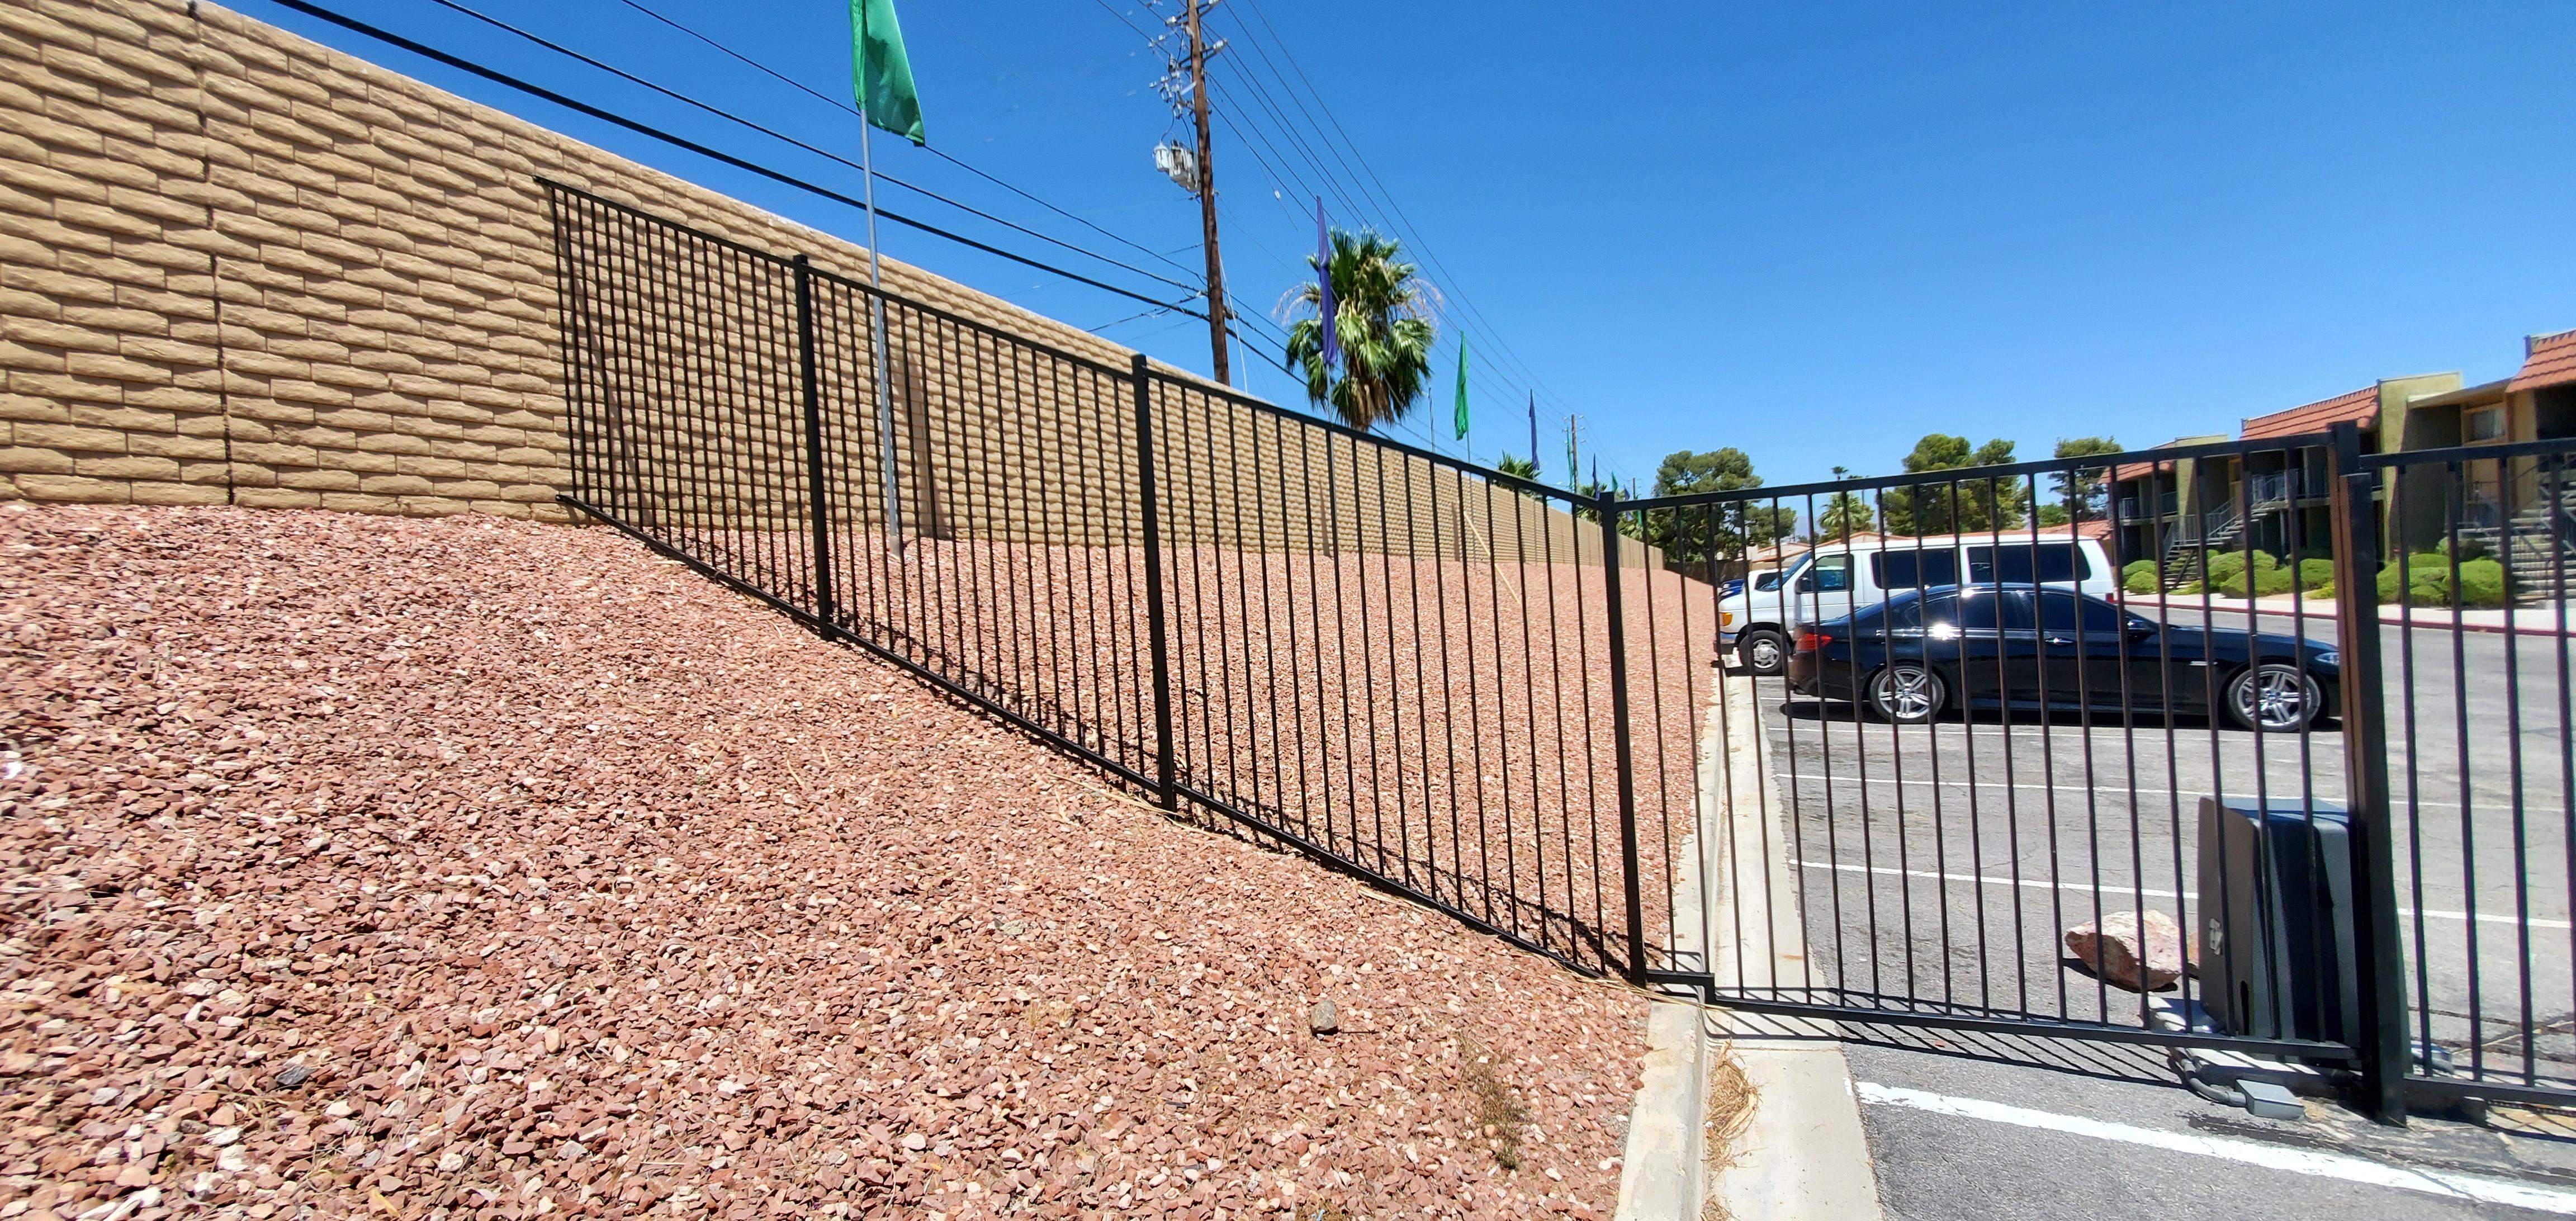 Apartment Fencing Las vegas - Intrepid Metal Works Inc.